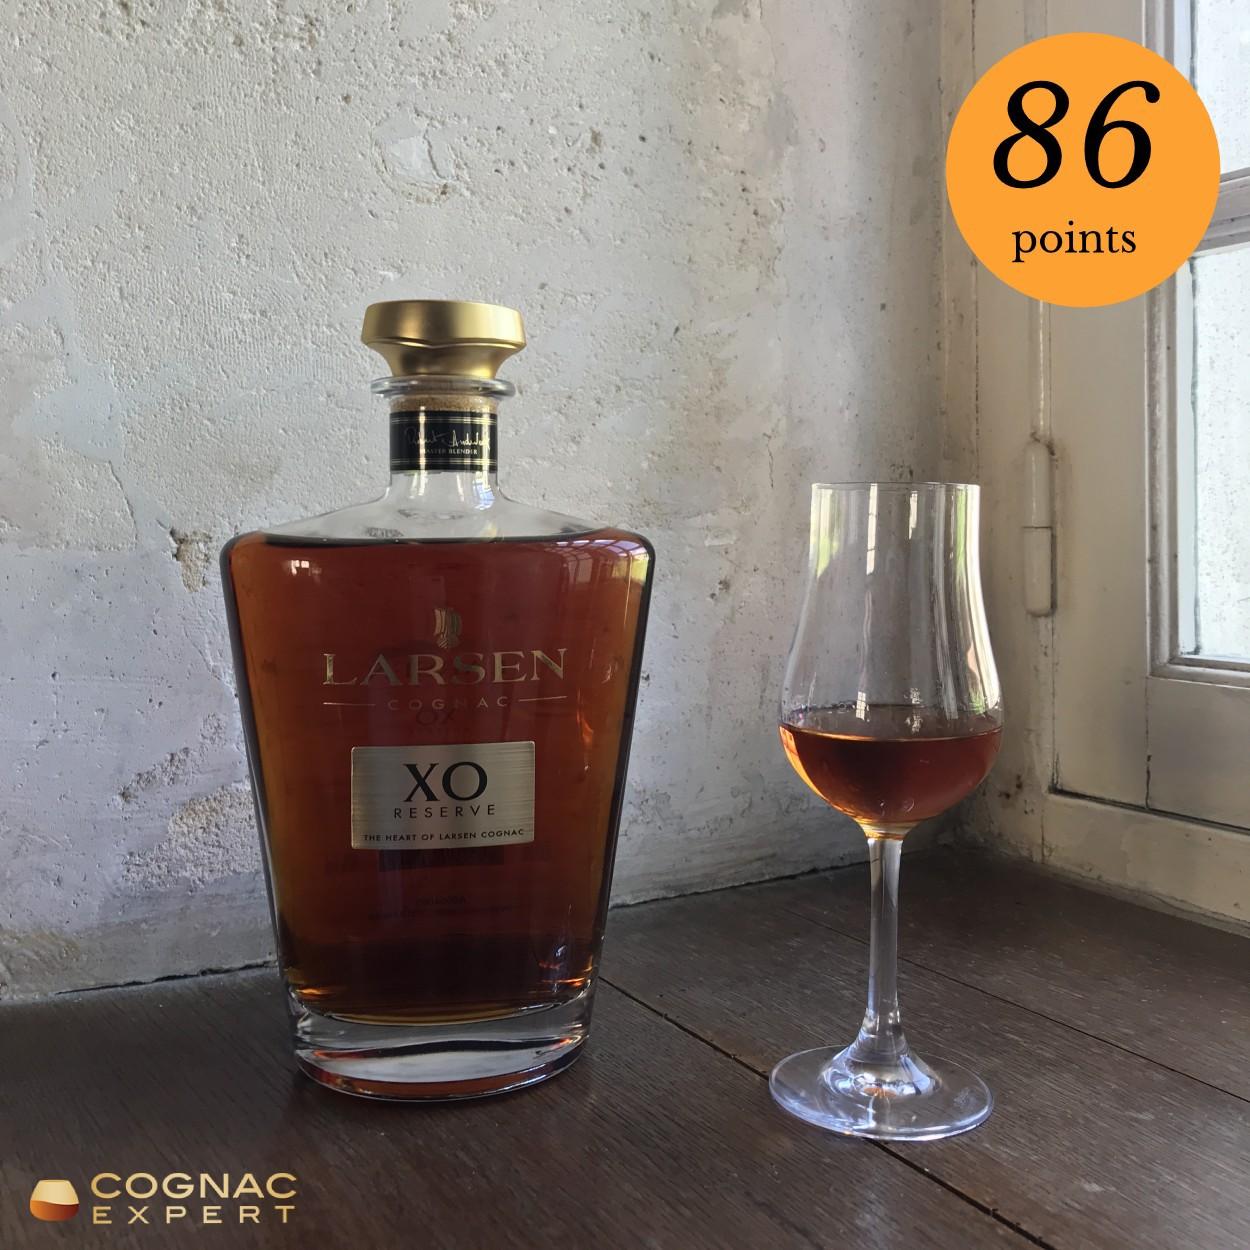 Larsen XO Cognac bottle and glass